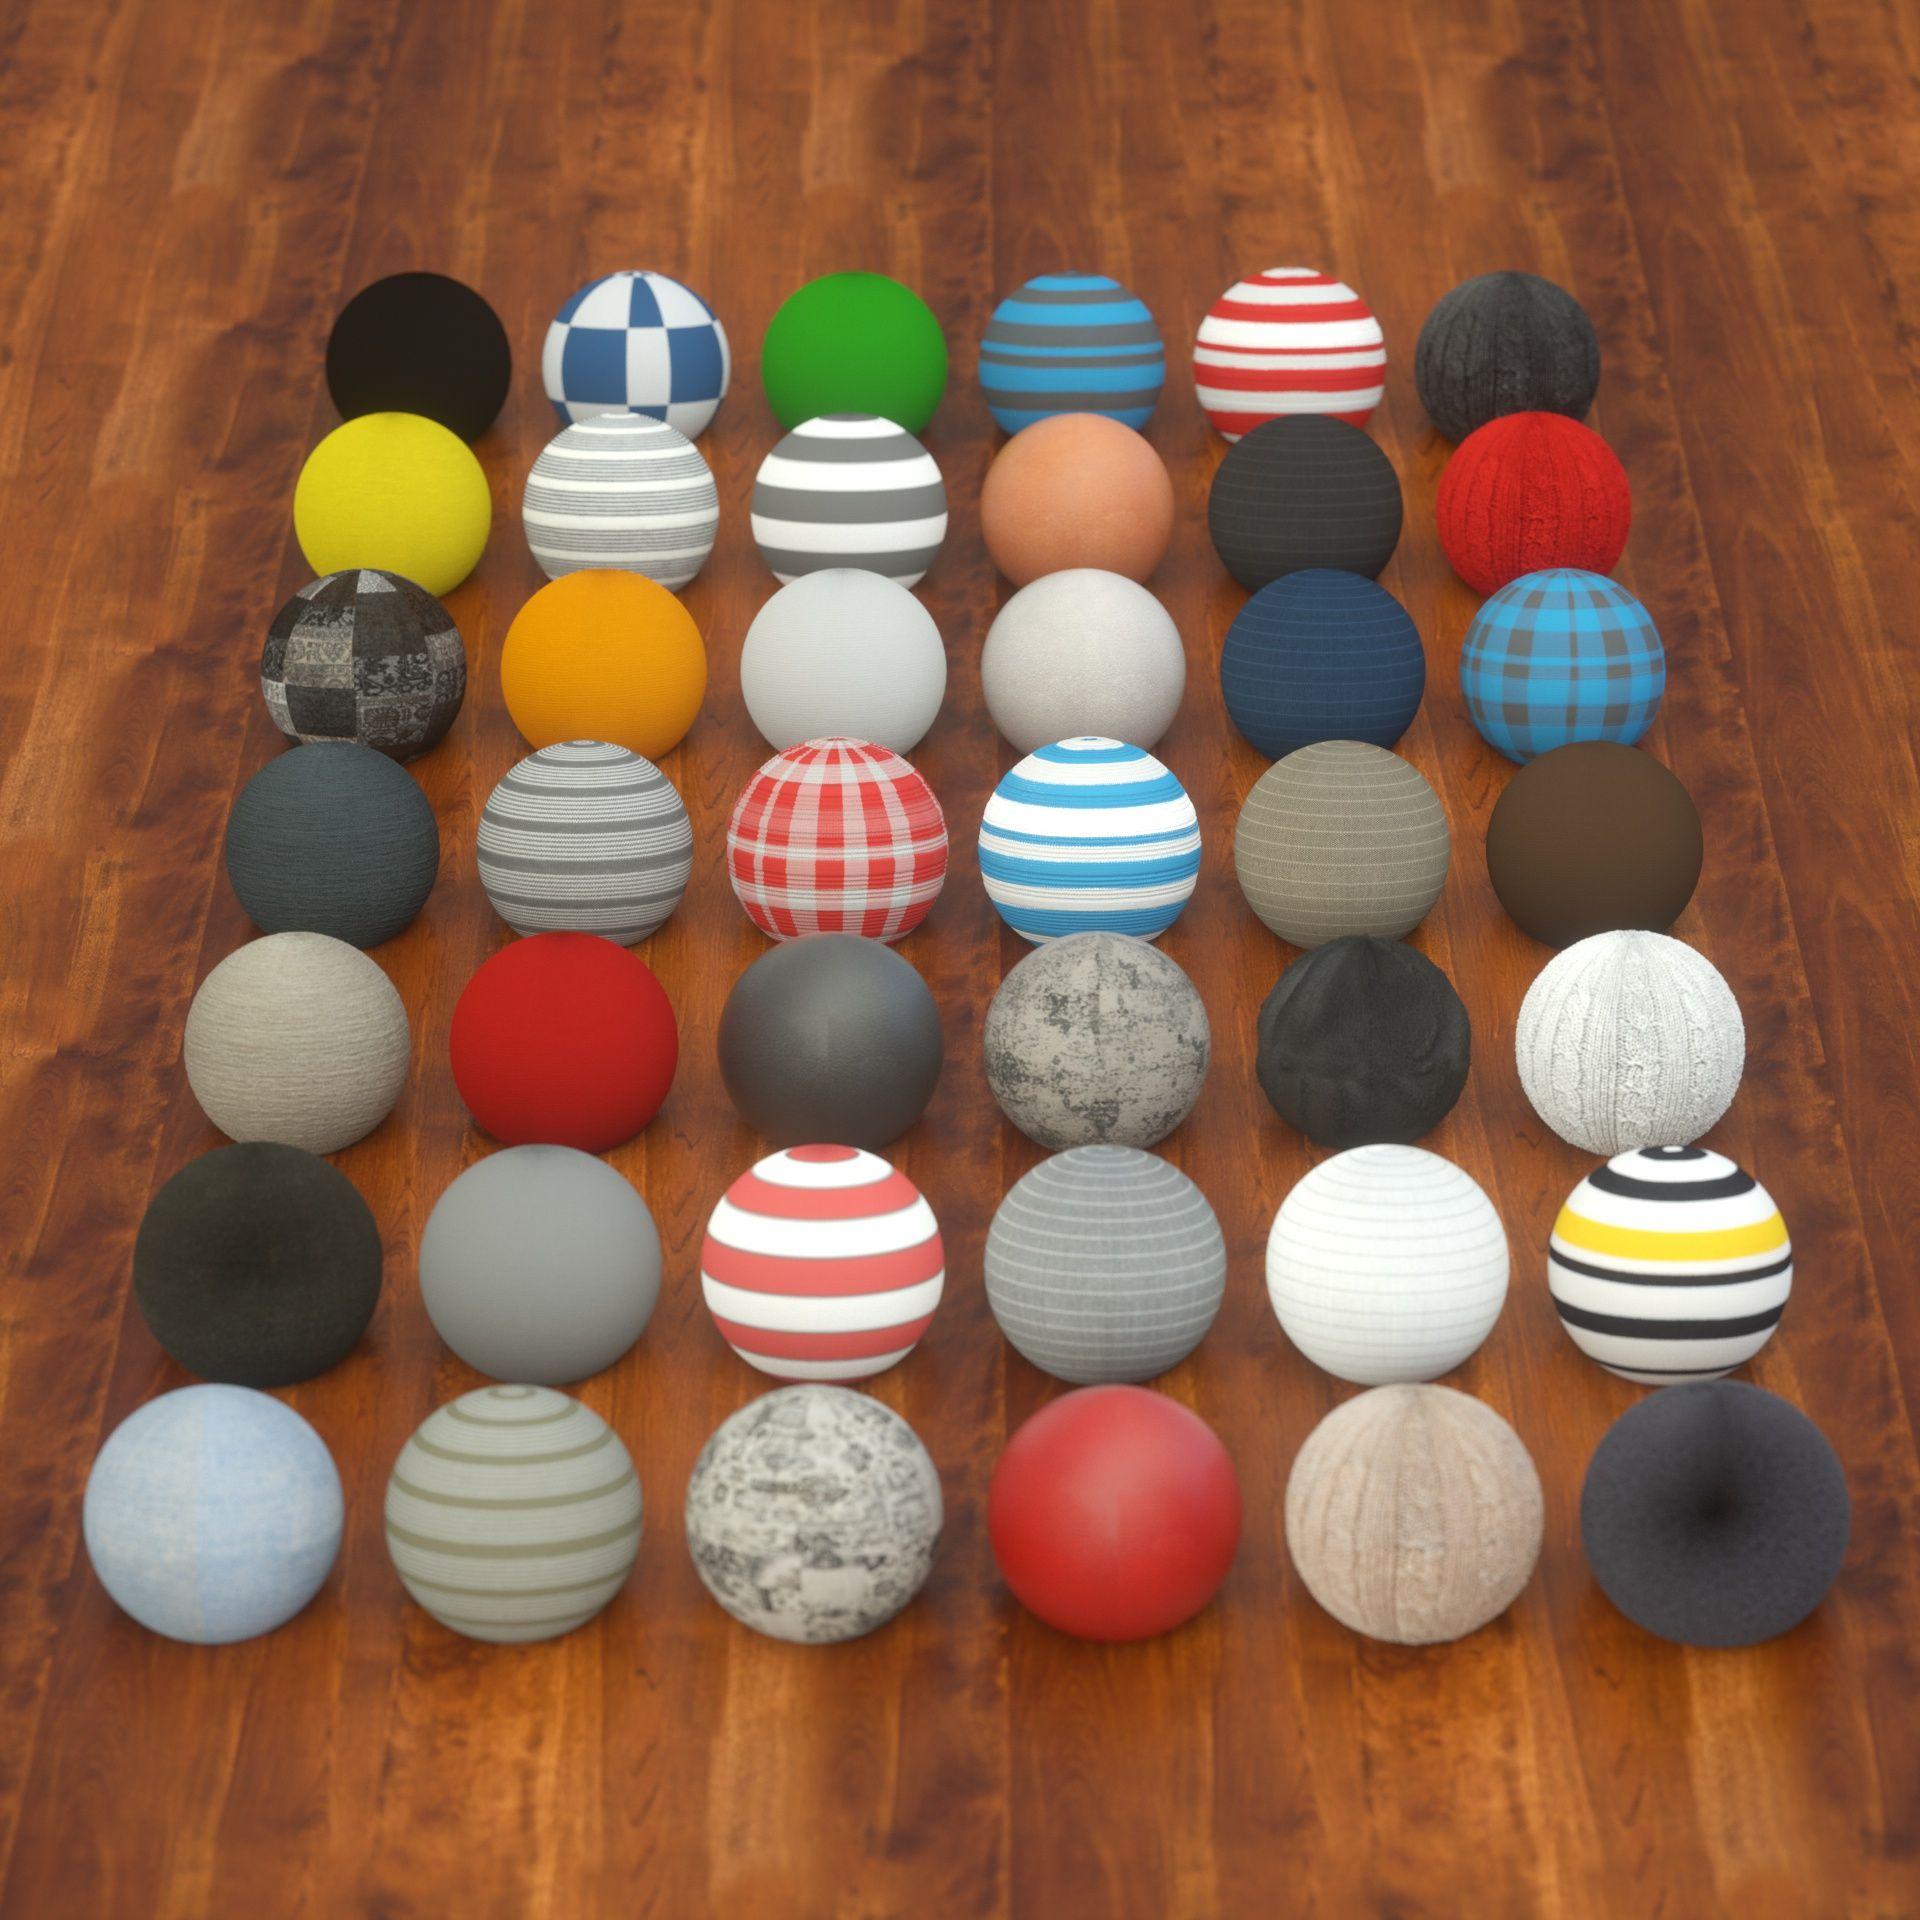 42 Fabric Materials for C4D Octane Render #Materials, #Fabric